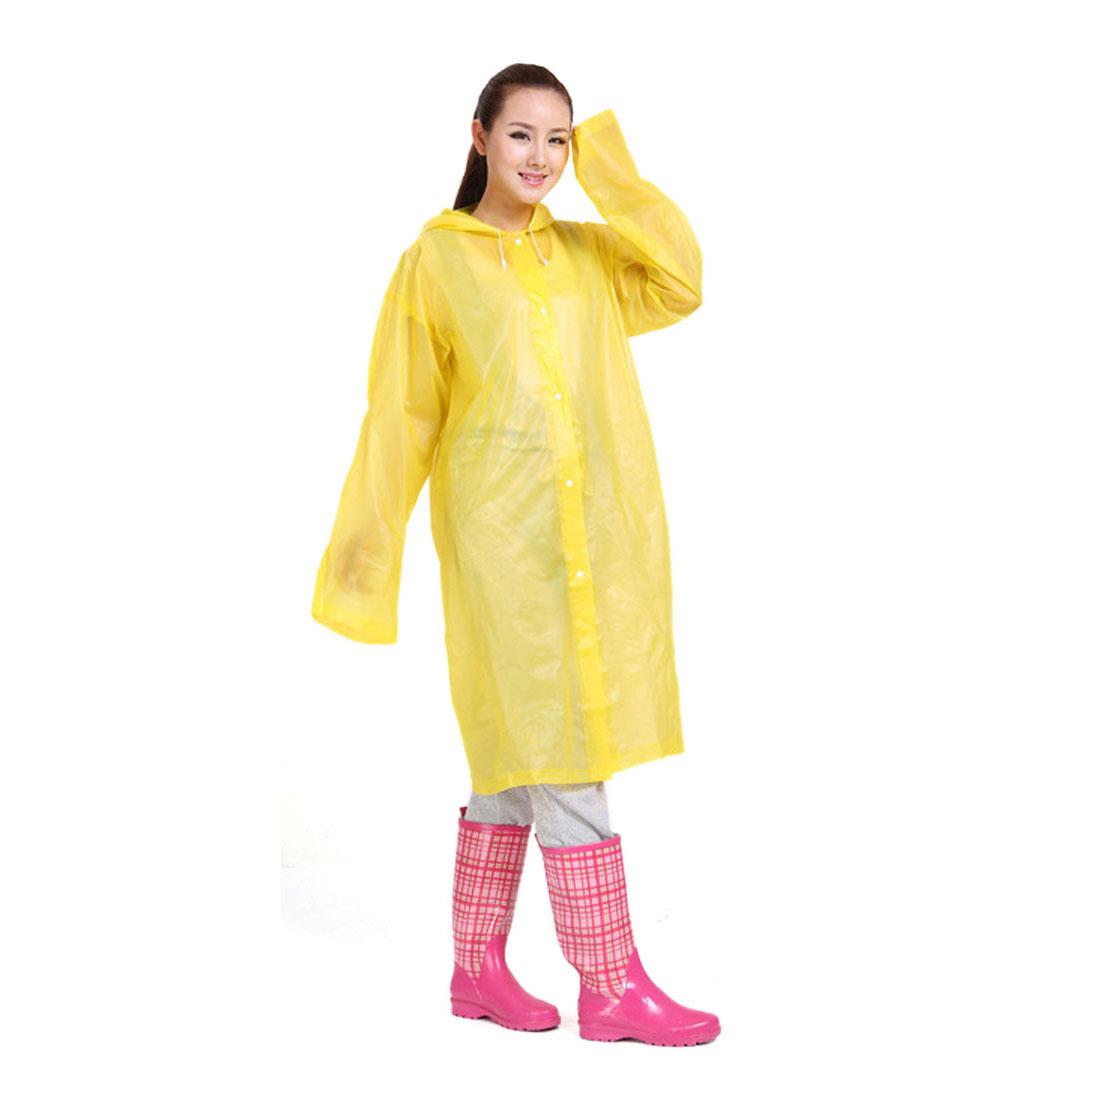 Yellow EVA Outdoor Waterproof Raincoat Rainwear Hooded Rain Poncho for Bicycle